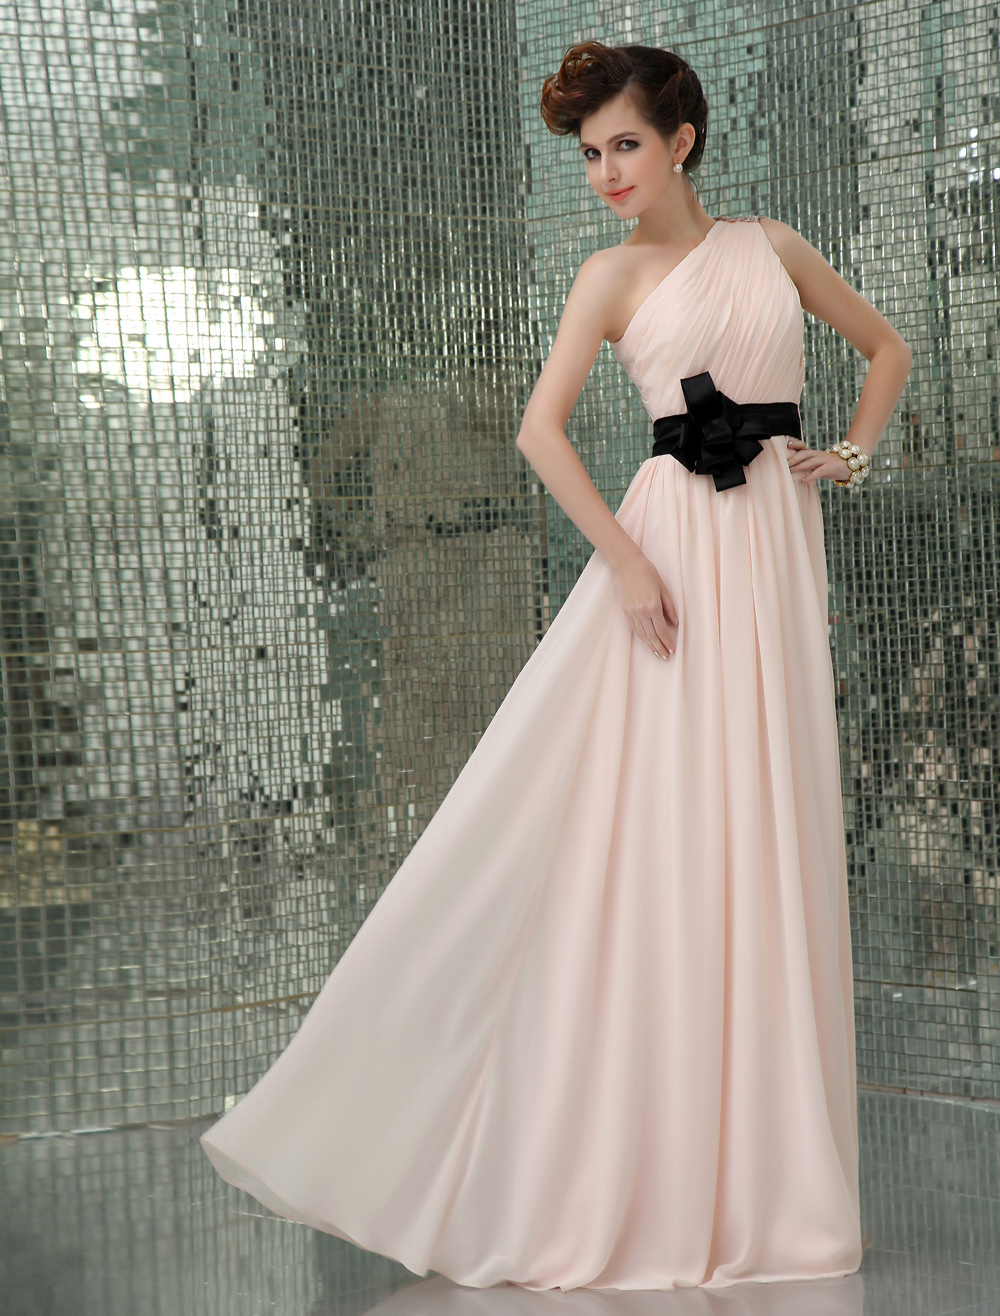 14ed8ad551 One-Shoulder Sash Evening Dress Wedding Guest Dress wedding guest dress